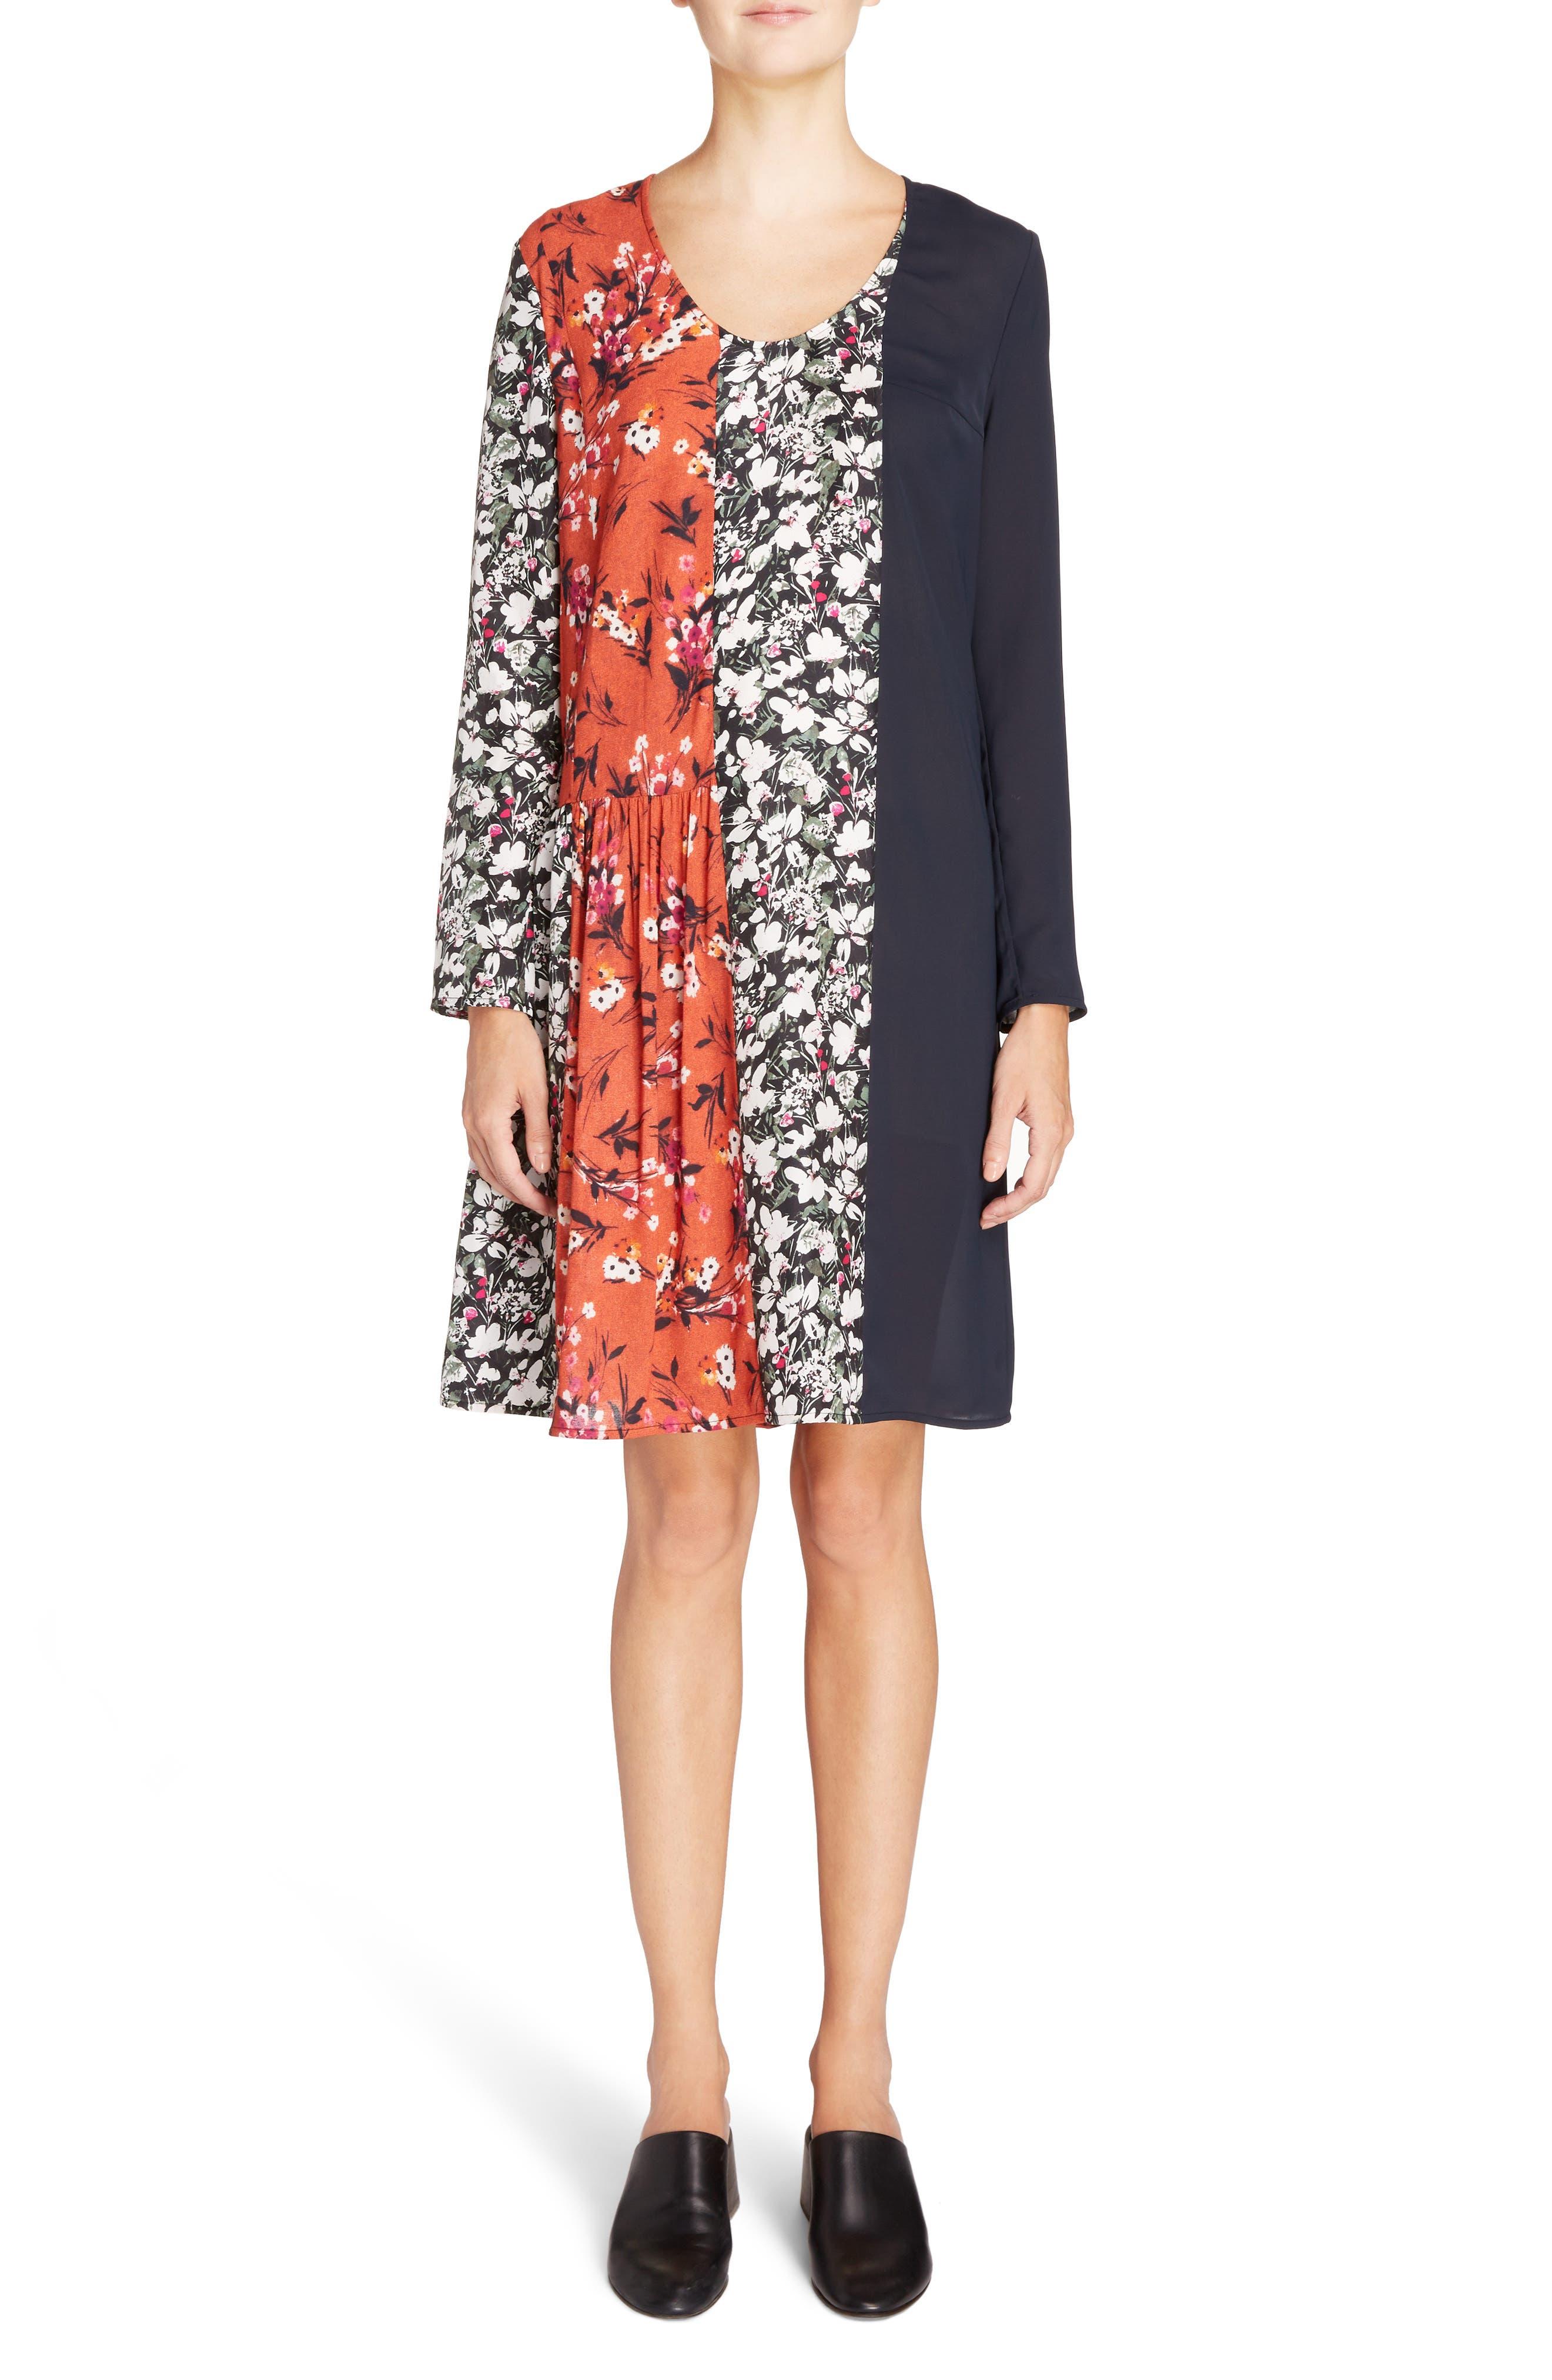 Jorny Print Shift Dress,                         Main,                         color, Off Black/ Black/ Orange